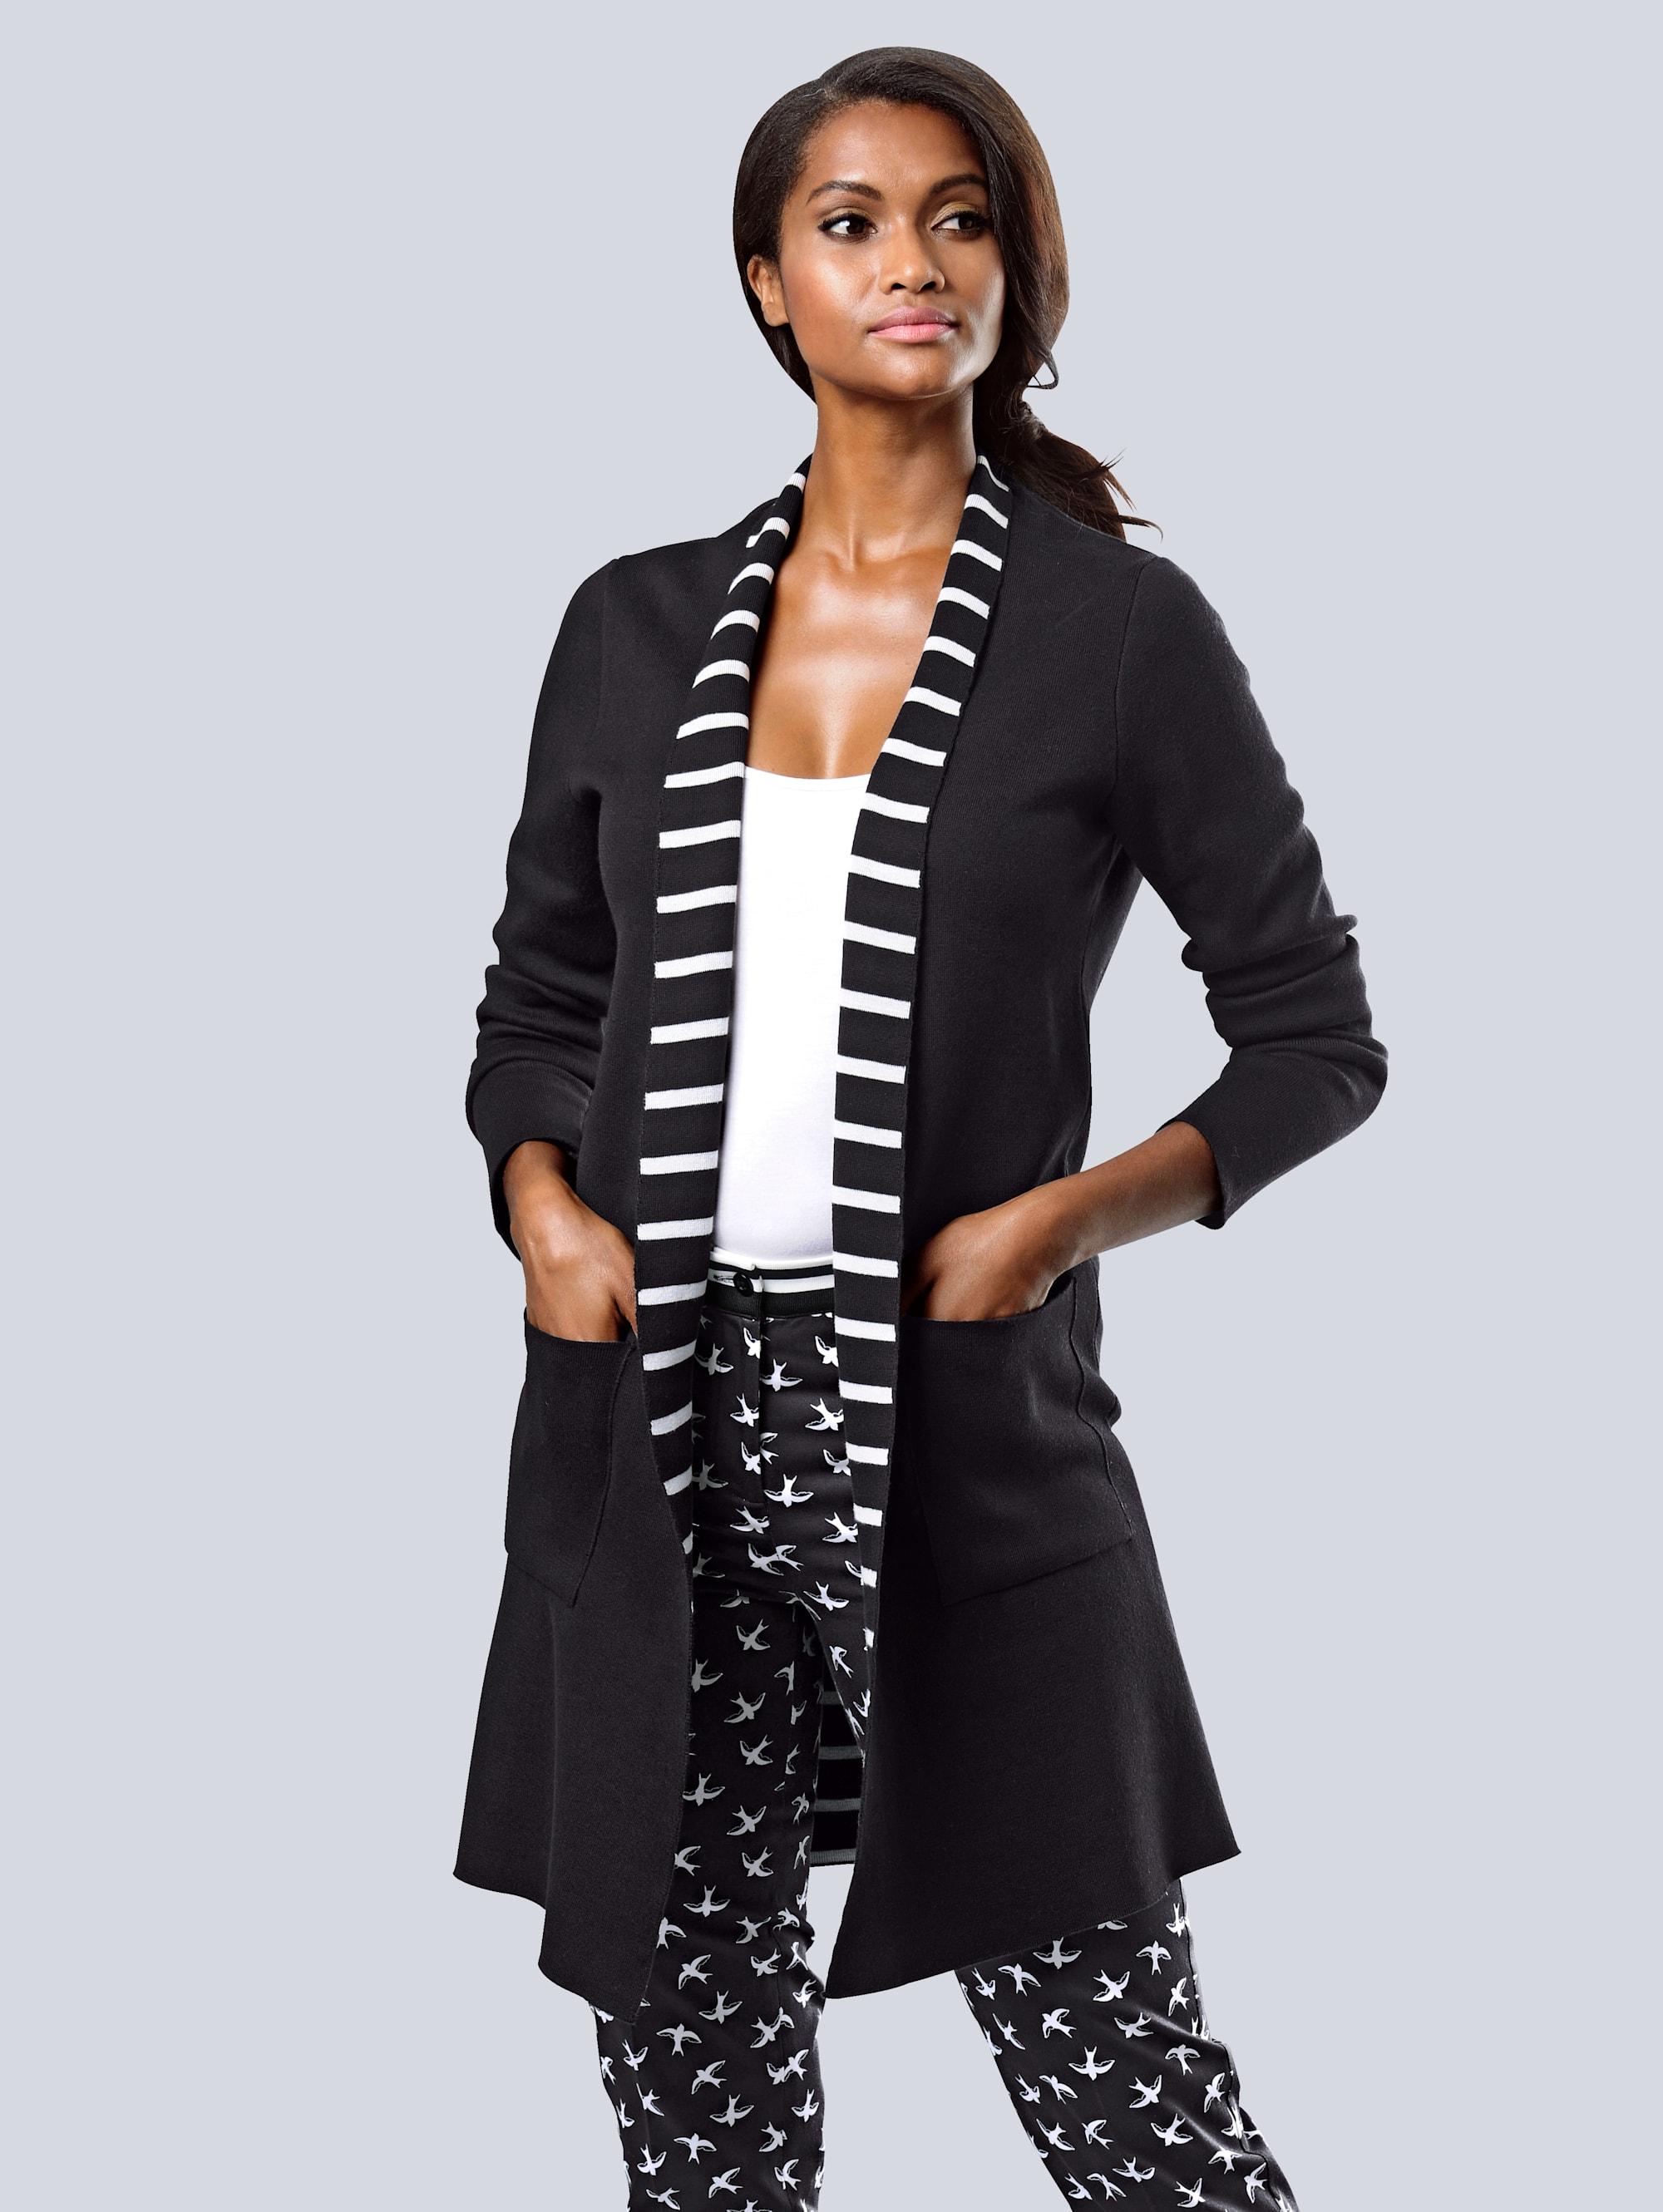 Alba Moda Strickjacke mit dekorativem Streifen-Dessin im Innenteil ISQSb VB0Yf